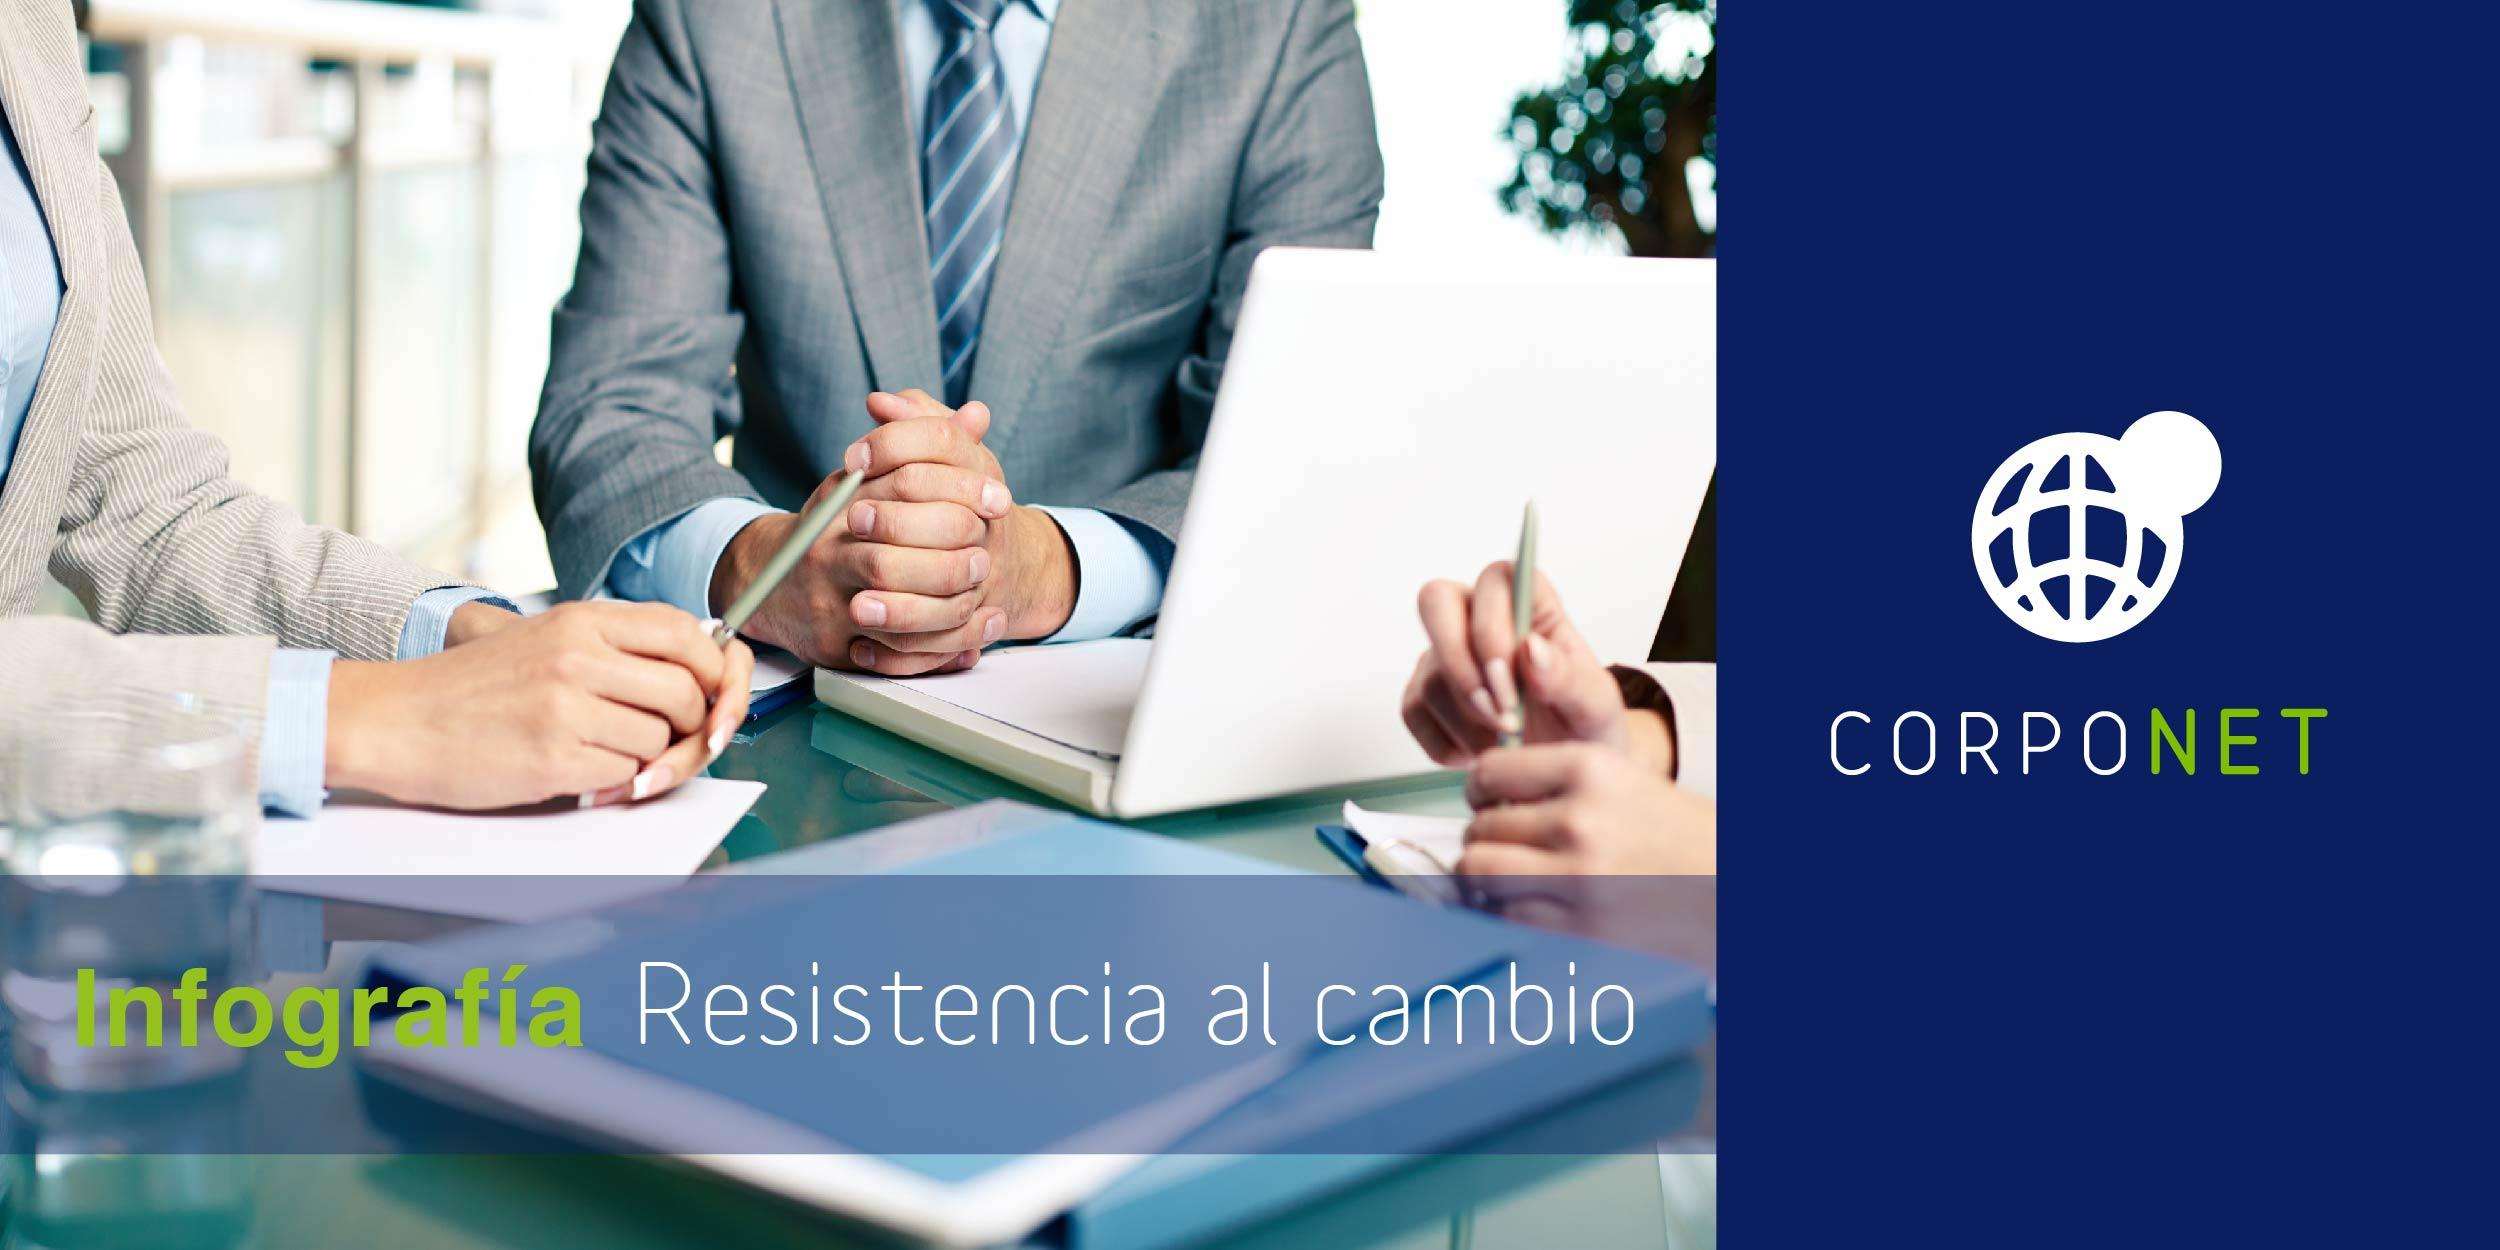 inf_resistencia_al_cambio